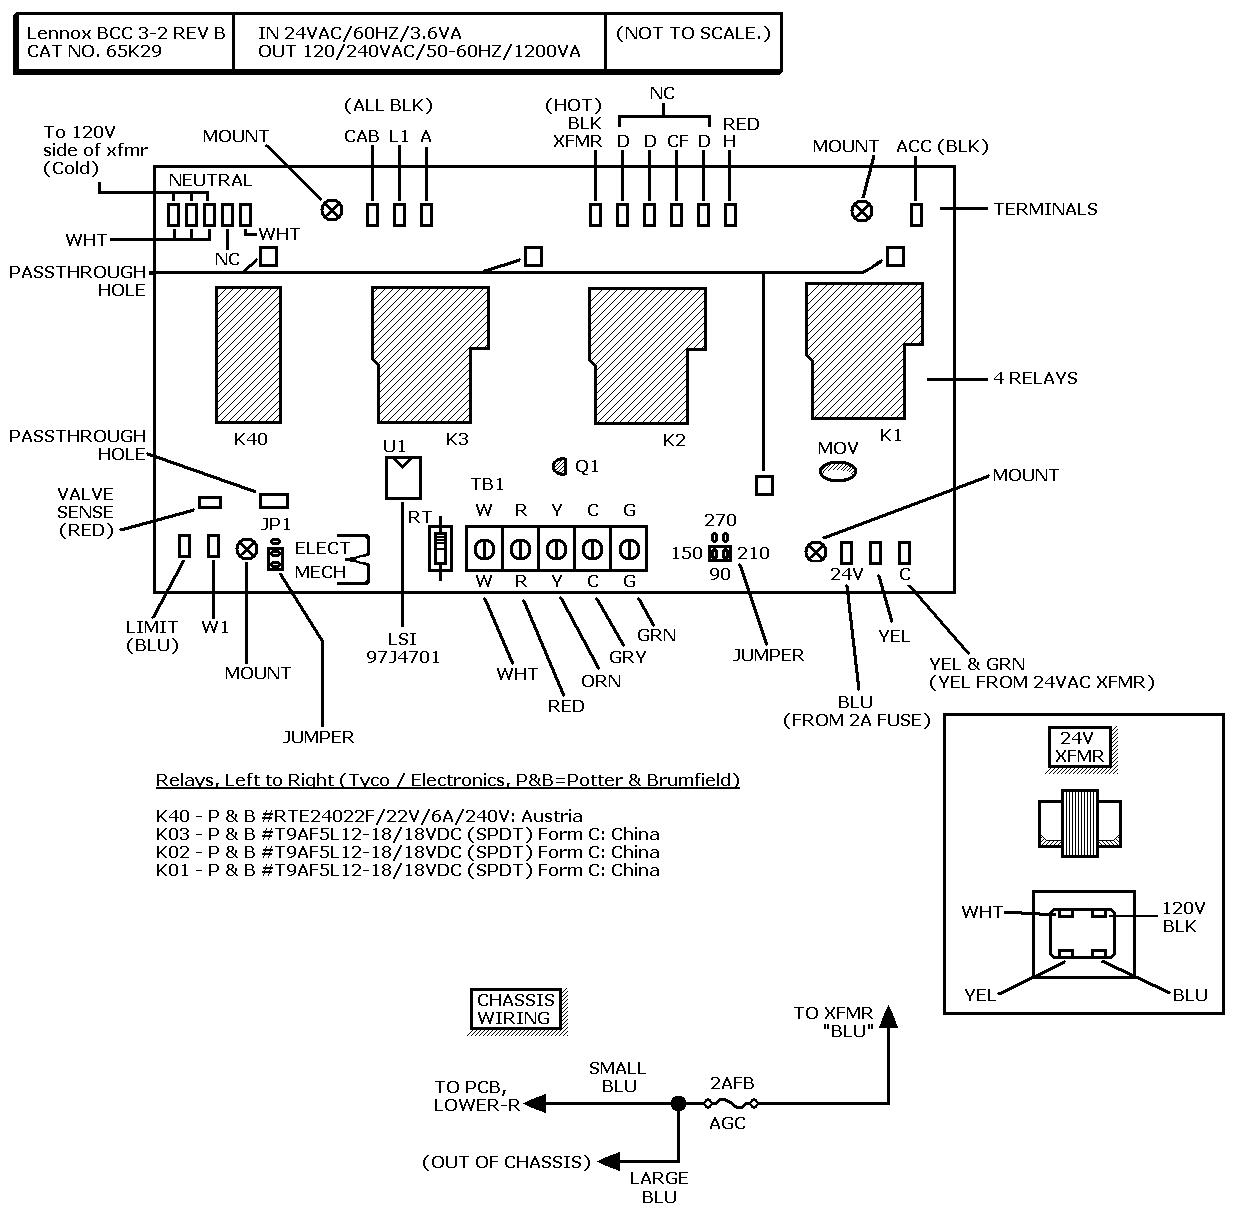 controller_furnace2?resize\=665%2C647 york thermostat wiring diagram & medium size of wiring York Diamond 80 Manual at cos-gaming.co